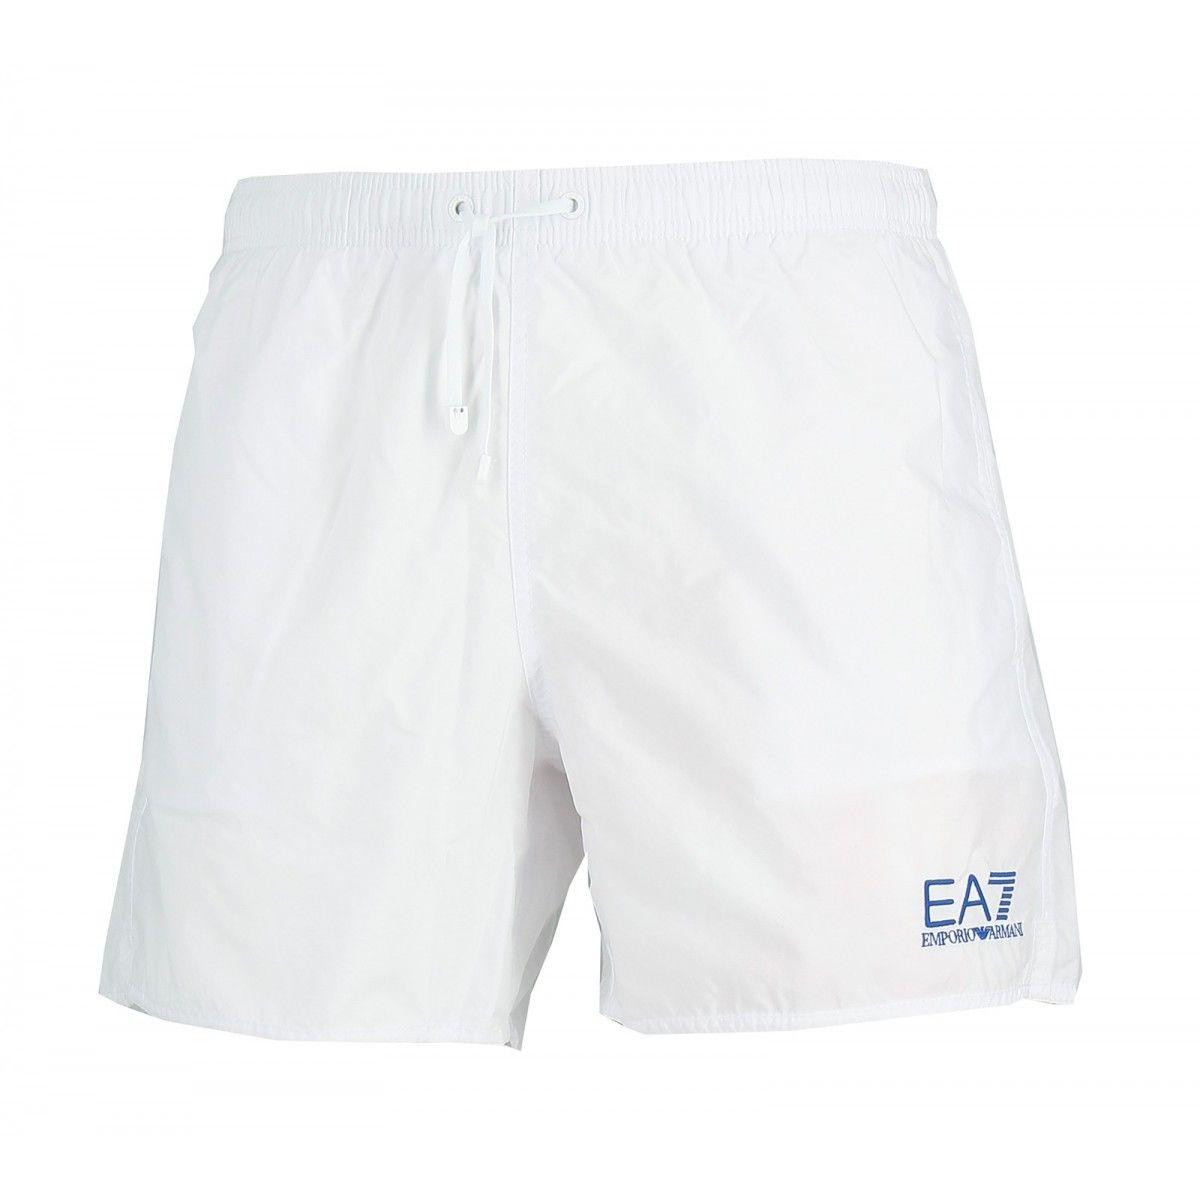 Short de bain EA7 Emporio Armani (Blanc)